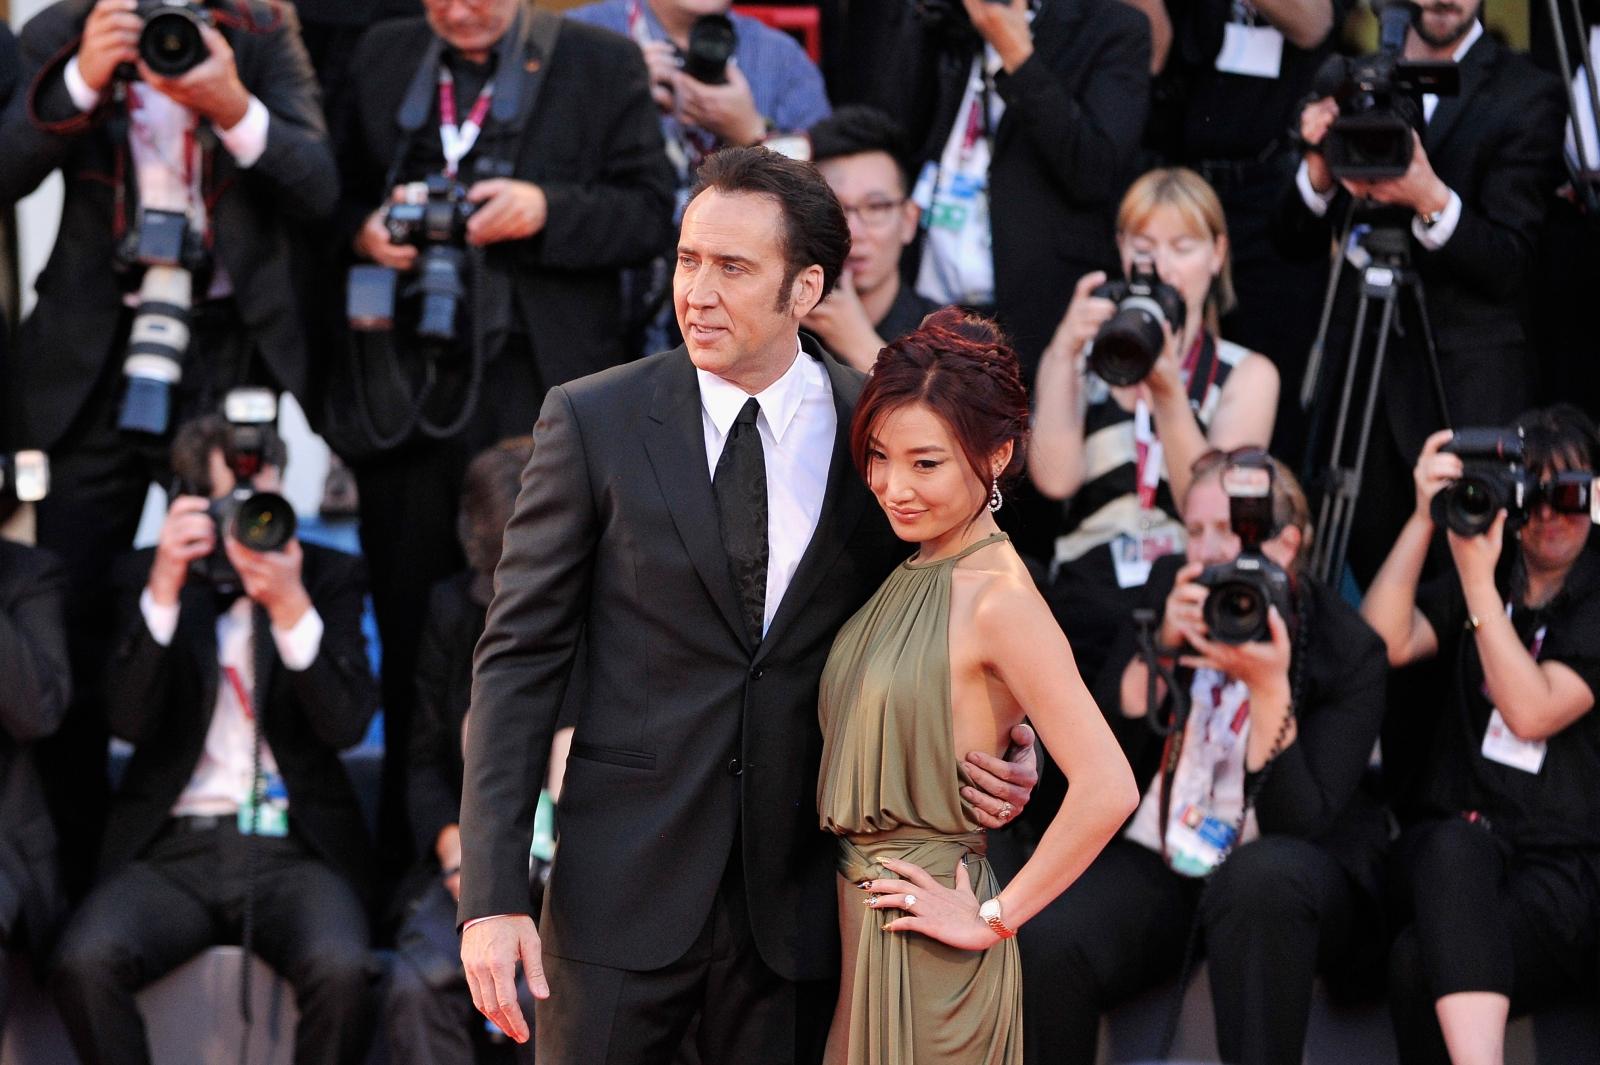 Actor Nicolas Cage and his wife Alice Kim Cage